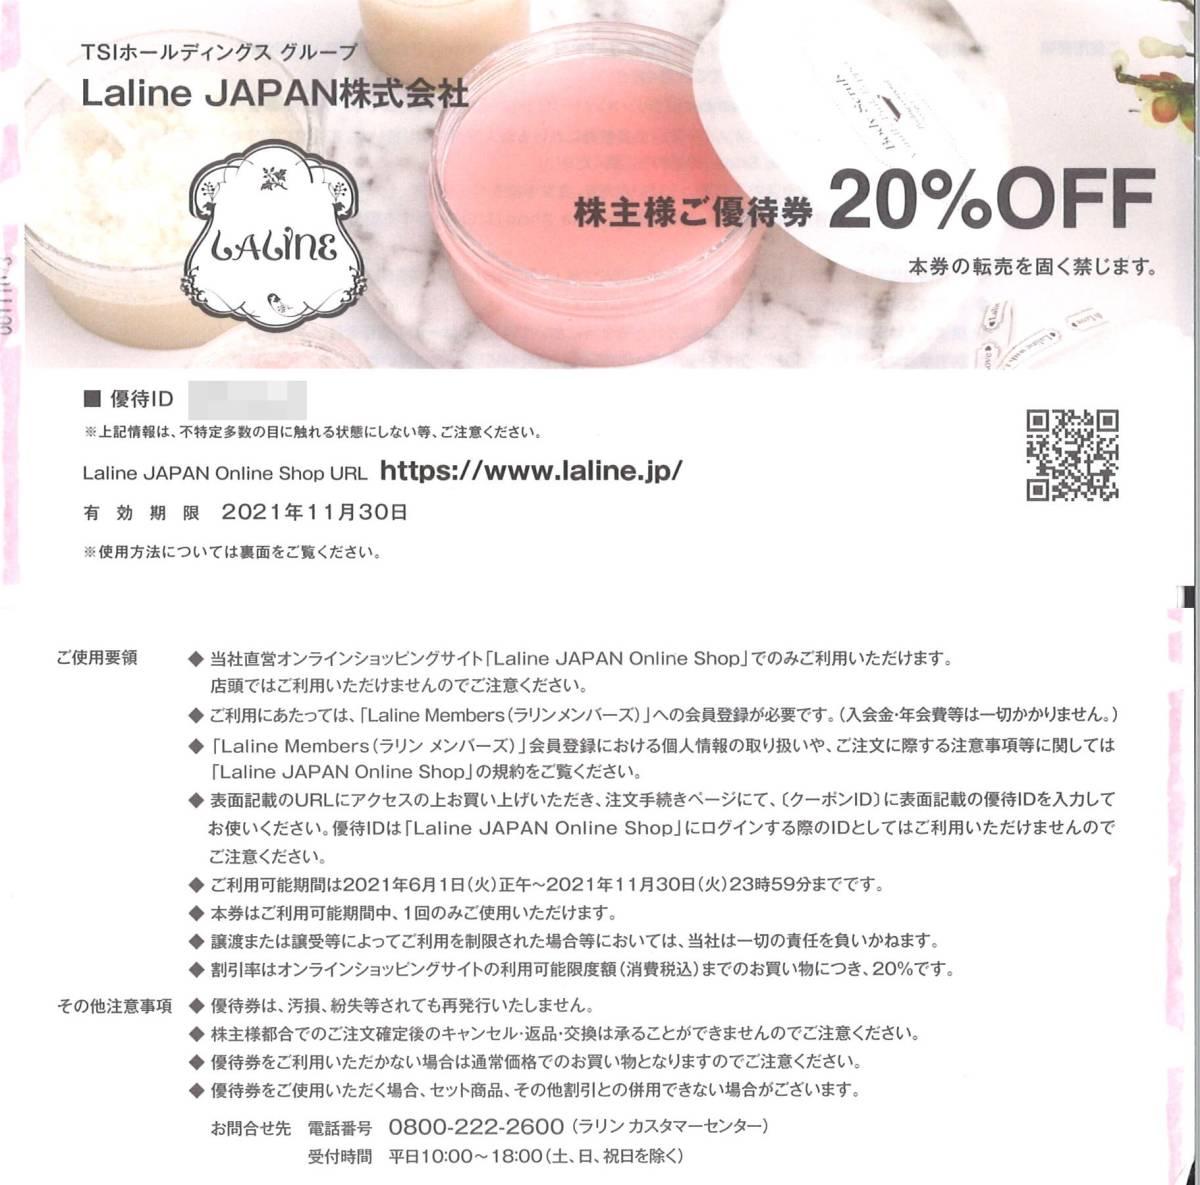 TSI 株主優待 Laline JAPAN 株主様ご優待券20%OFF(1枚) 有効期限:2021.11.30 割引券/ラリンジャパン オンラインストア_画像1